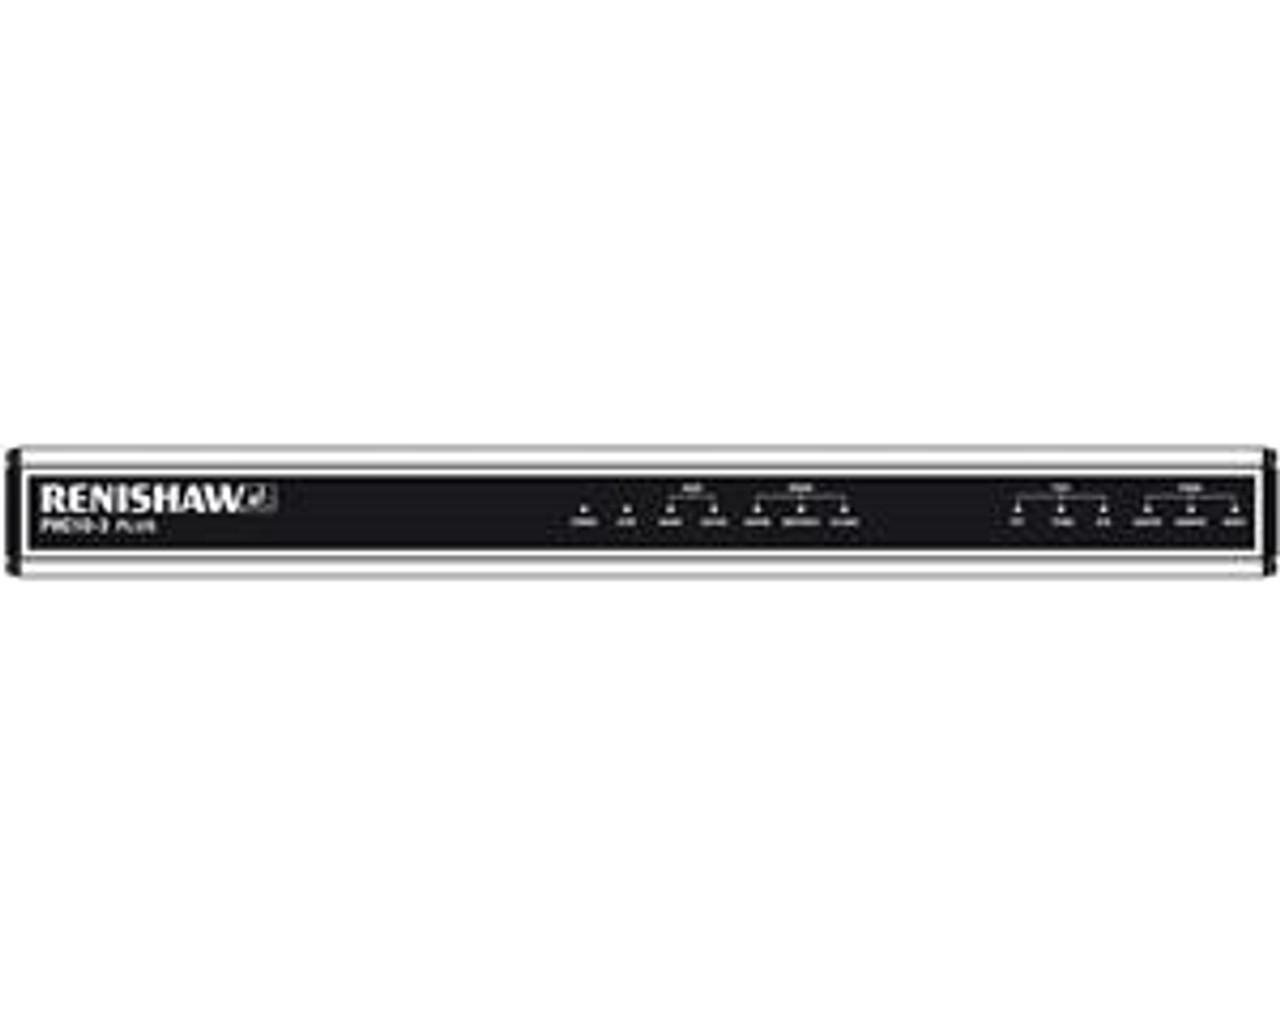 Renishaw PHC10-3 PLUS Controller with internal PI200-3   A-5863-0200    RenishawProbe